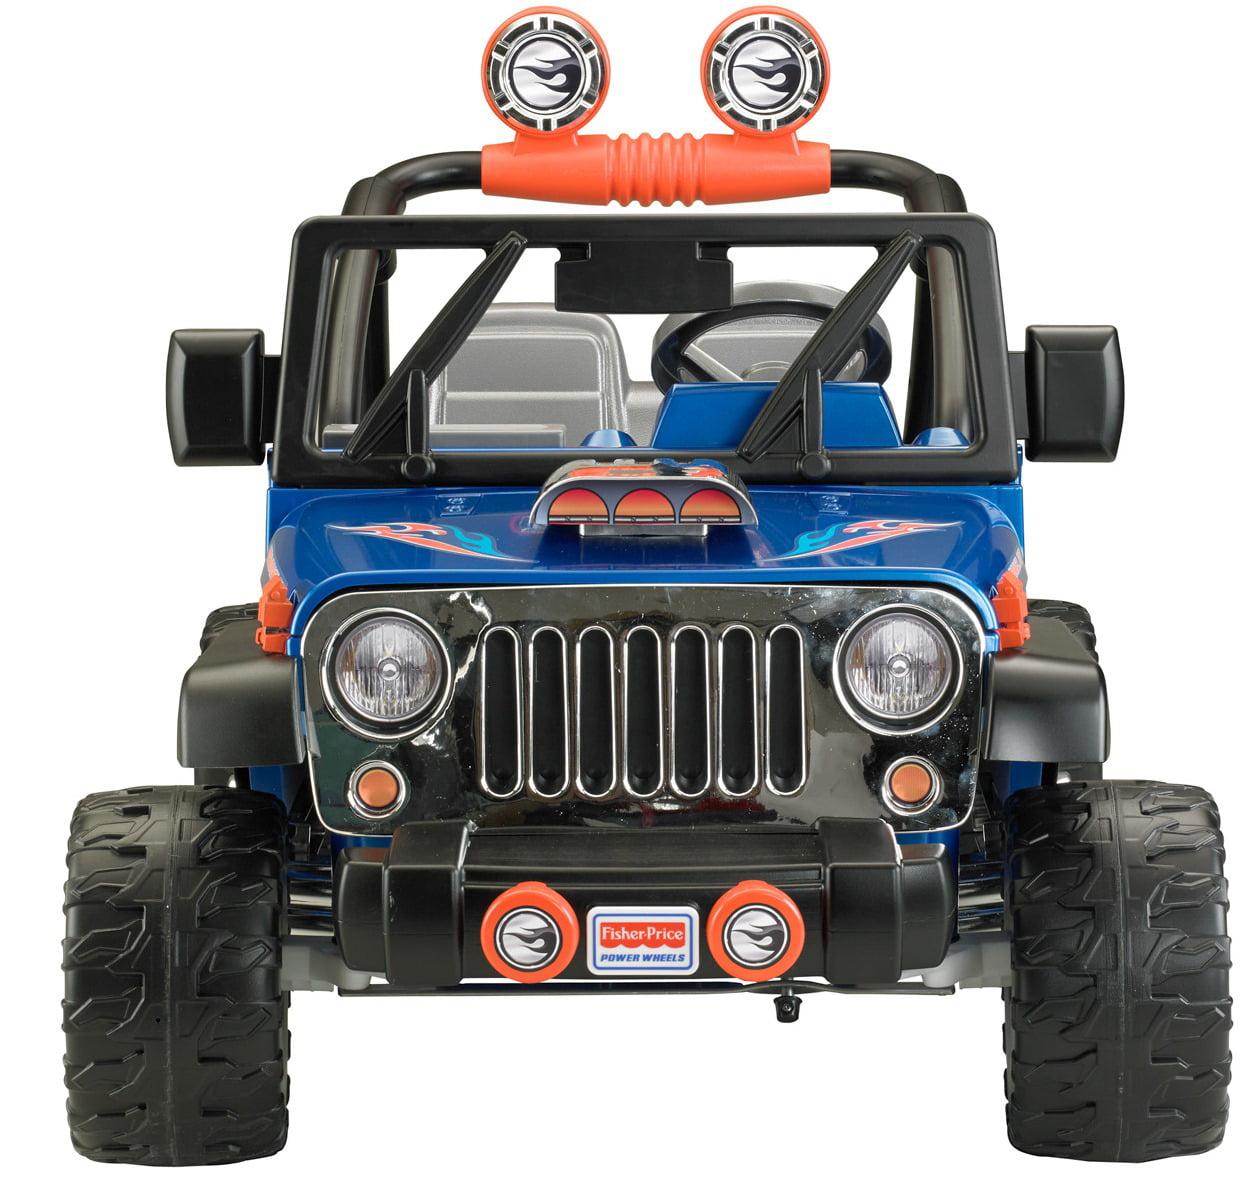 Power Wheels Hot Wheels Jeep Wrangler 12-Volt Battery-Powered Ride